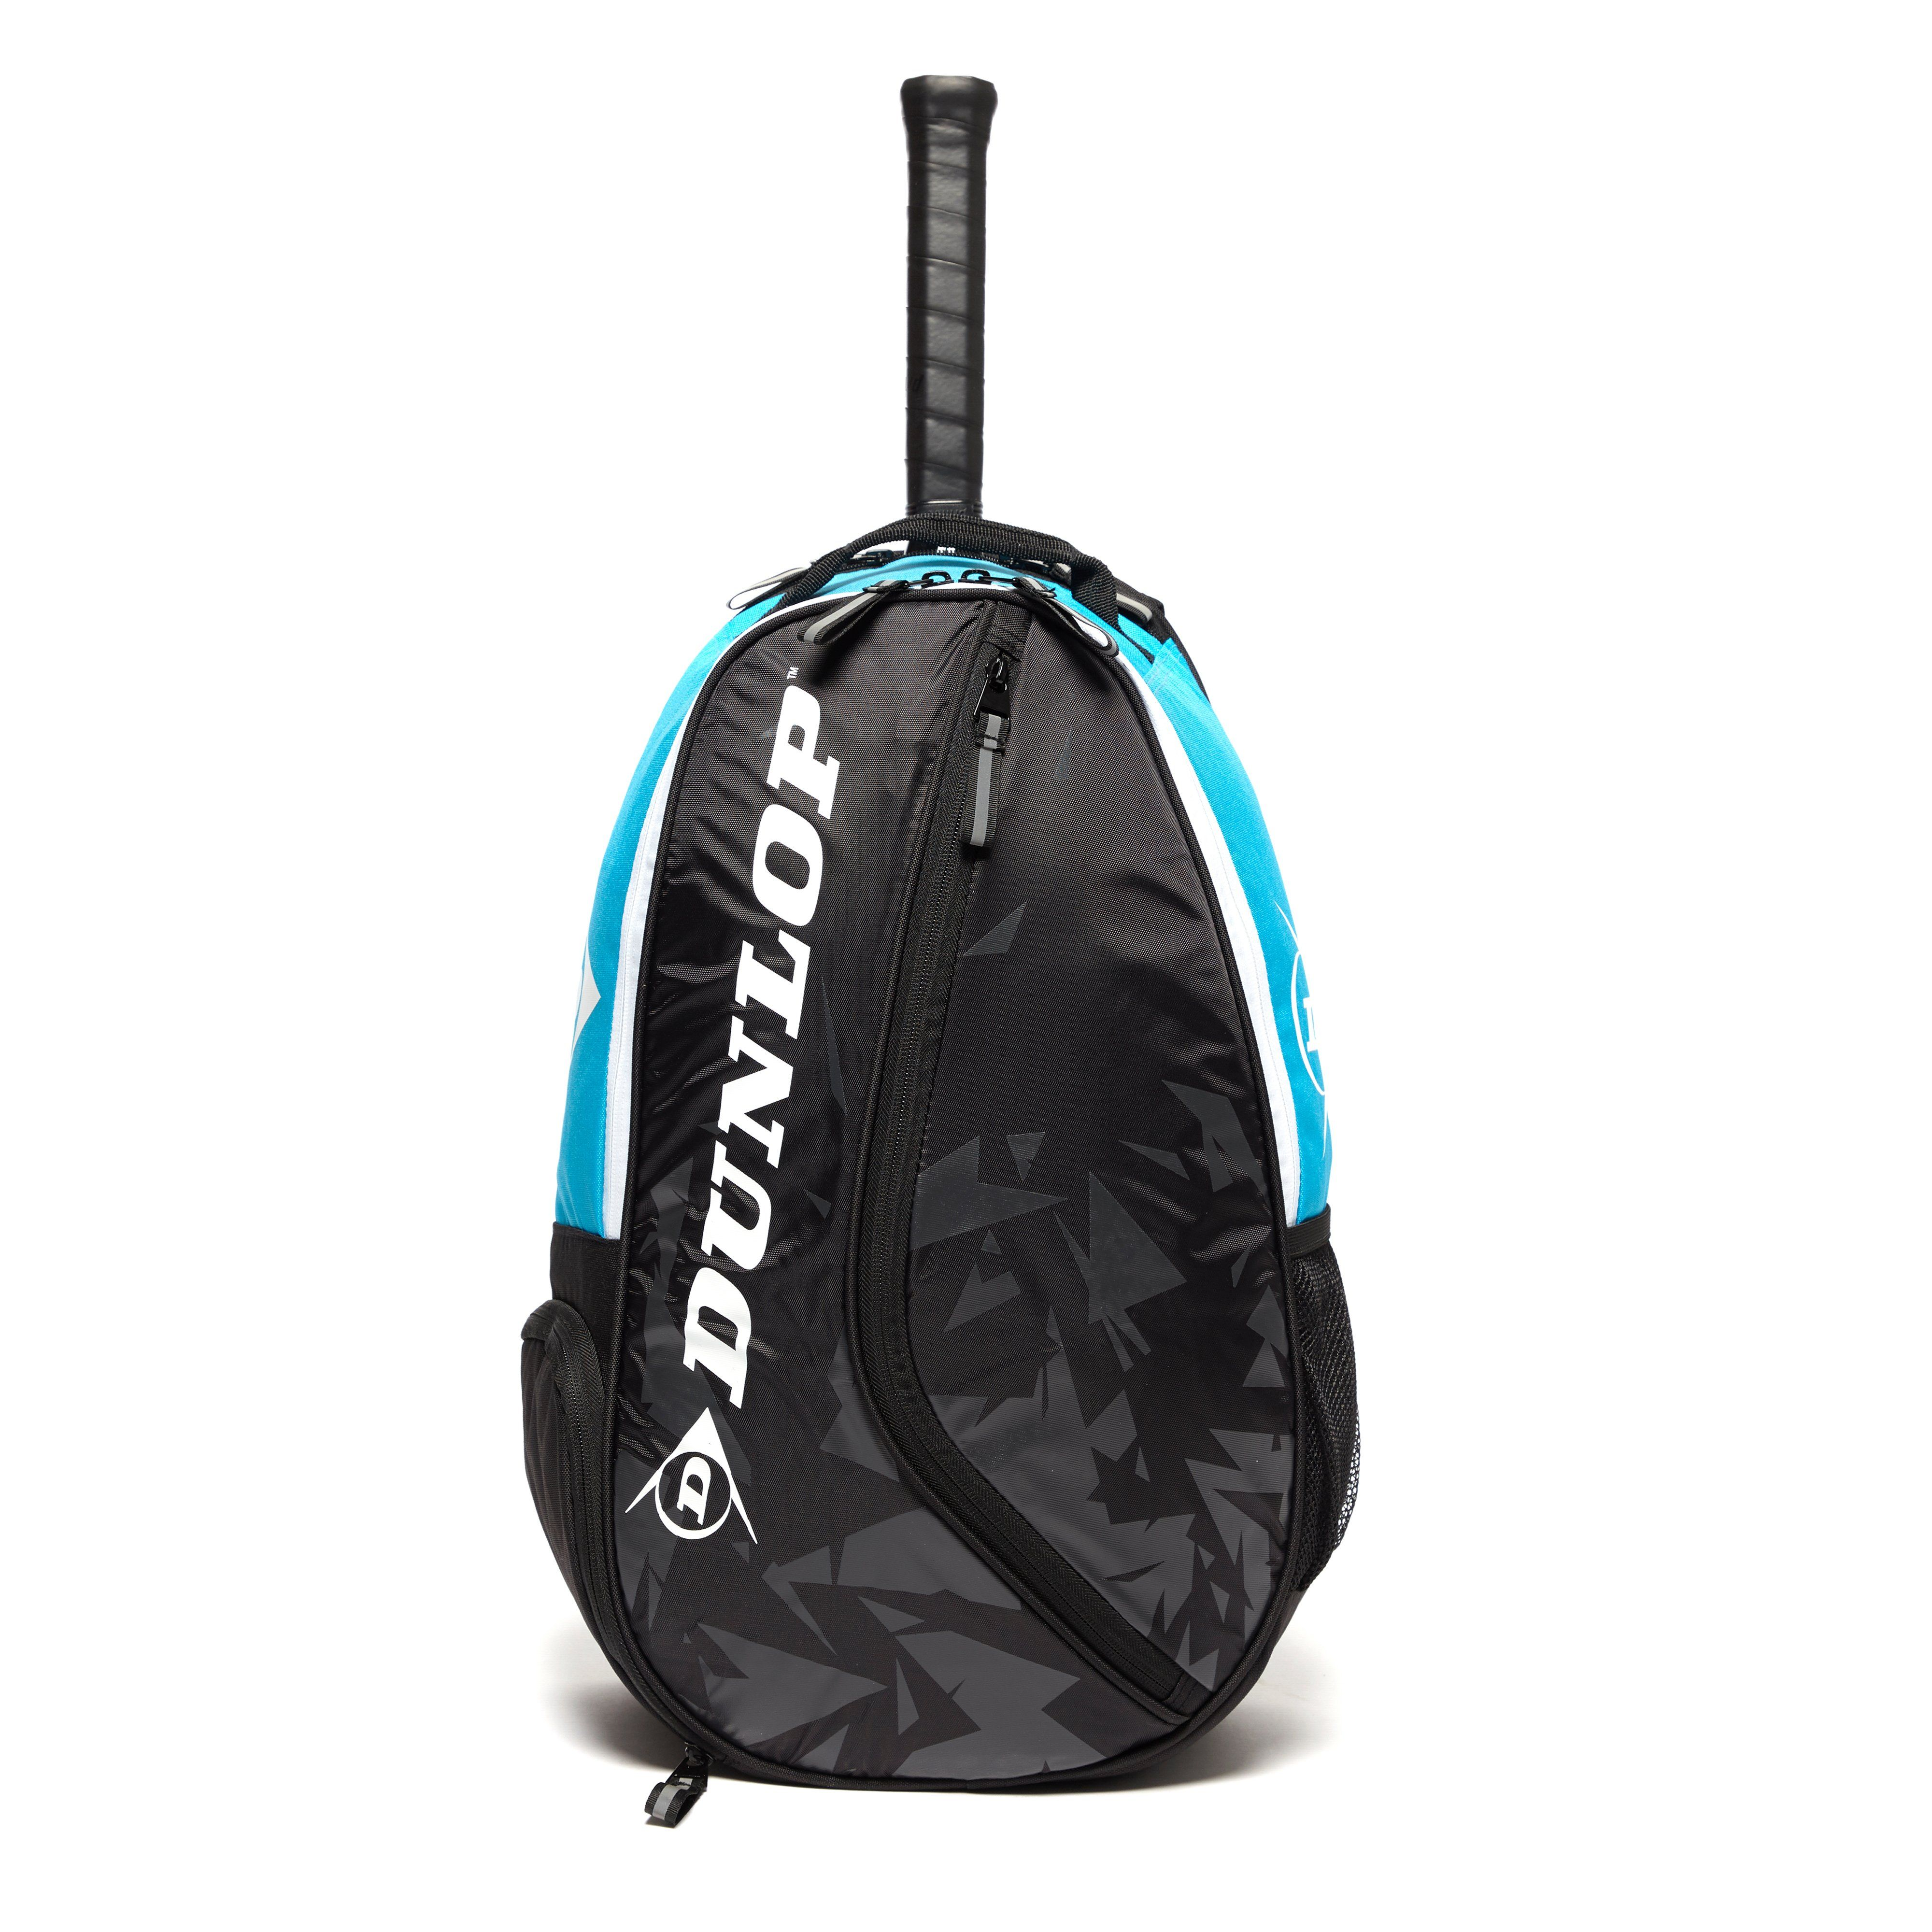 Dunlop Tour 2.0 Backpack